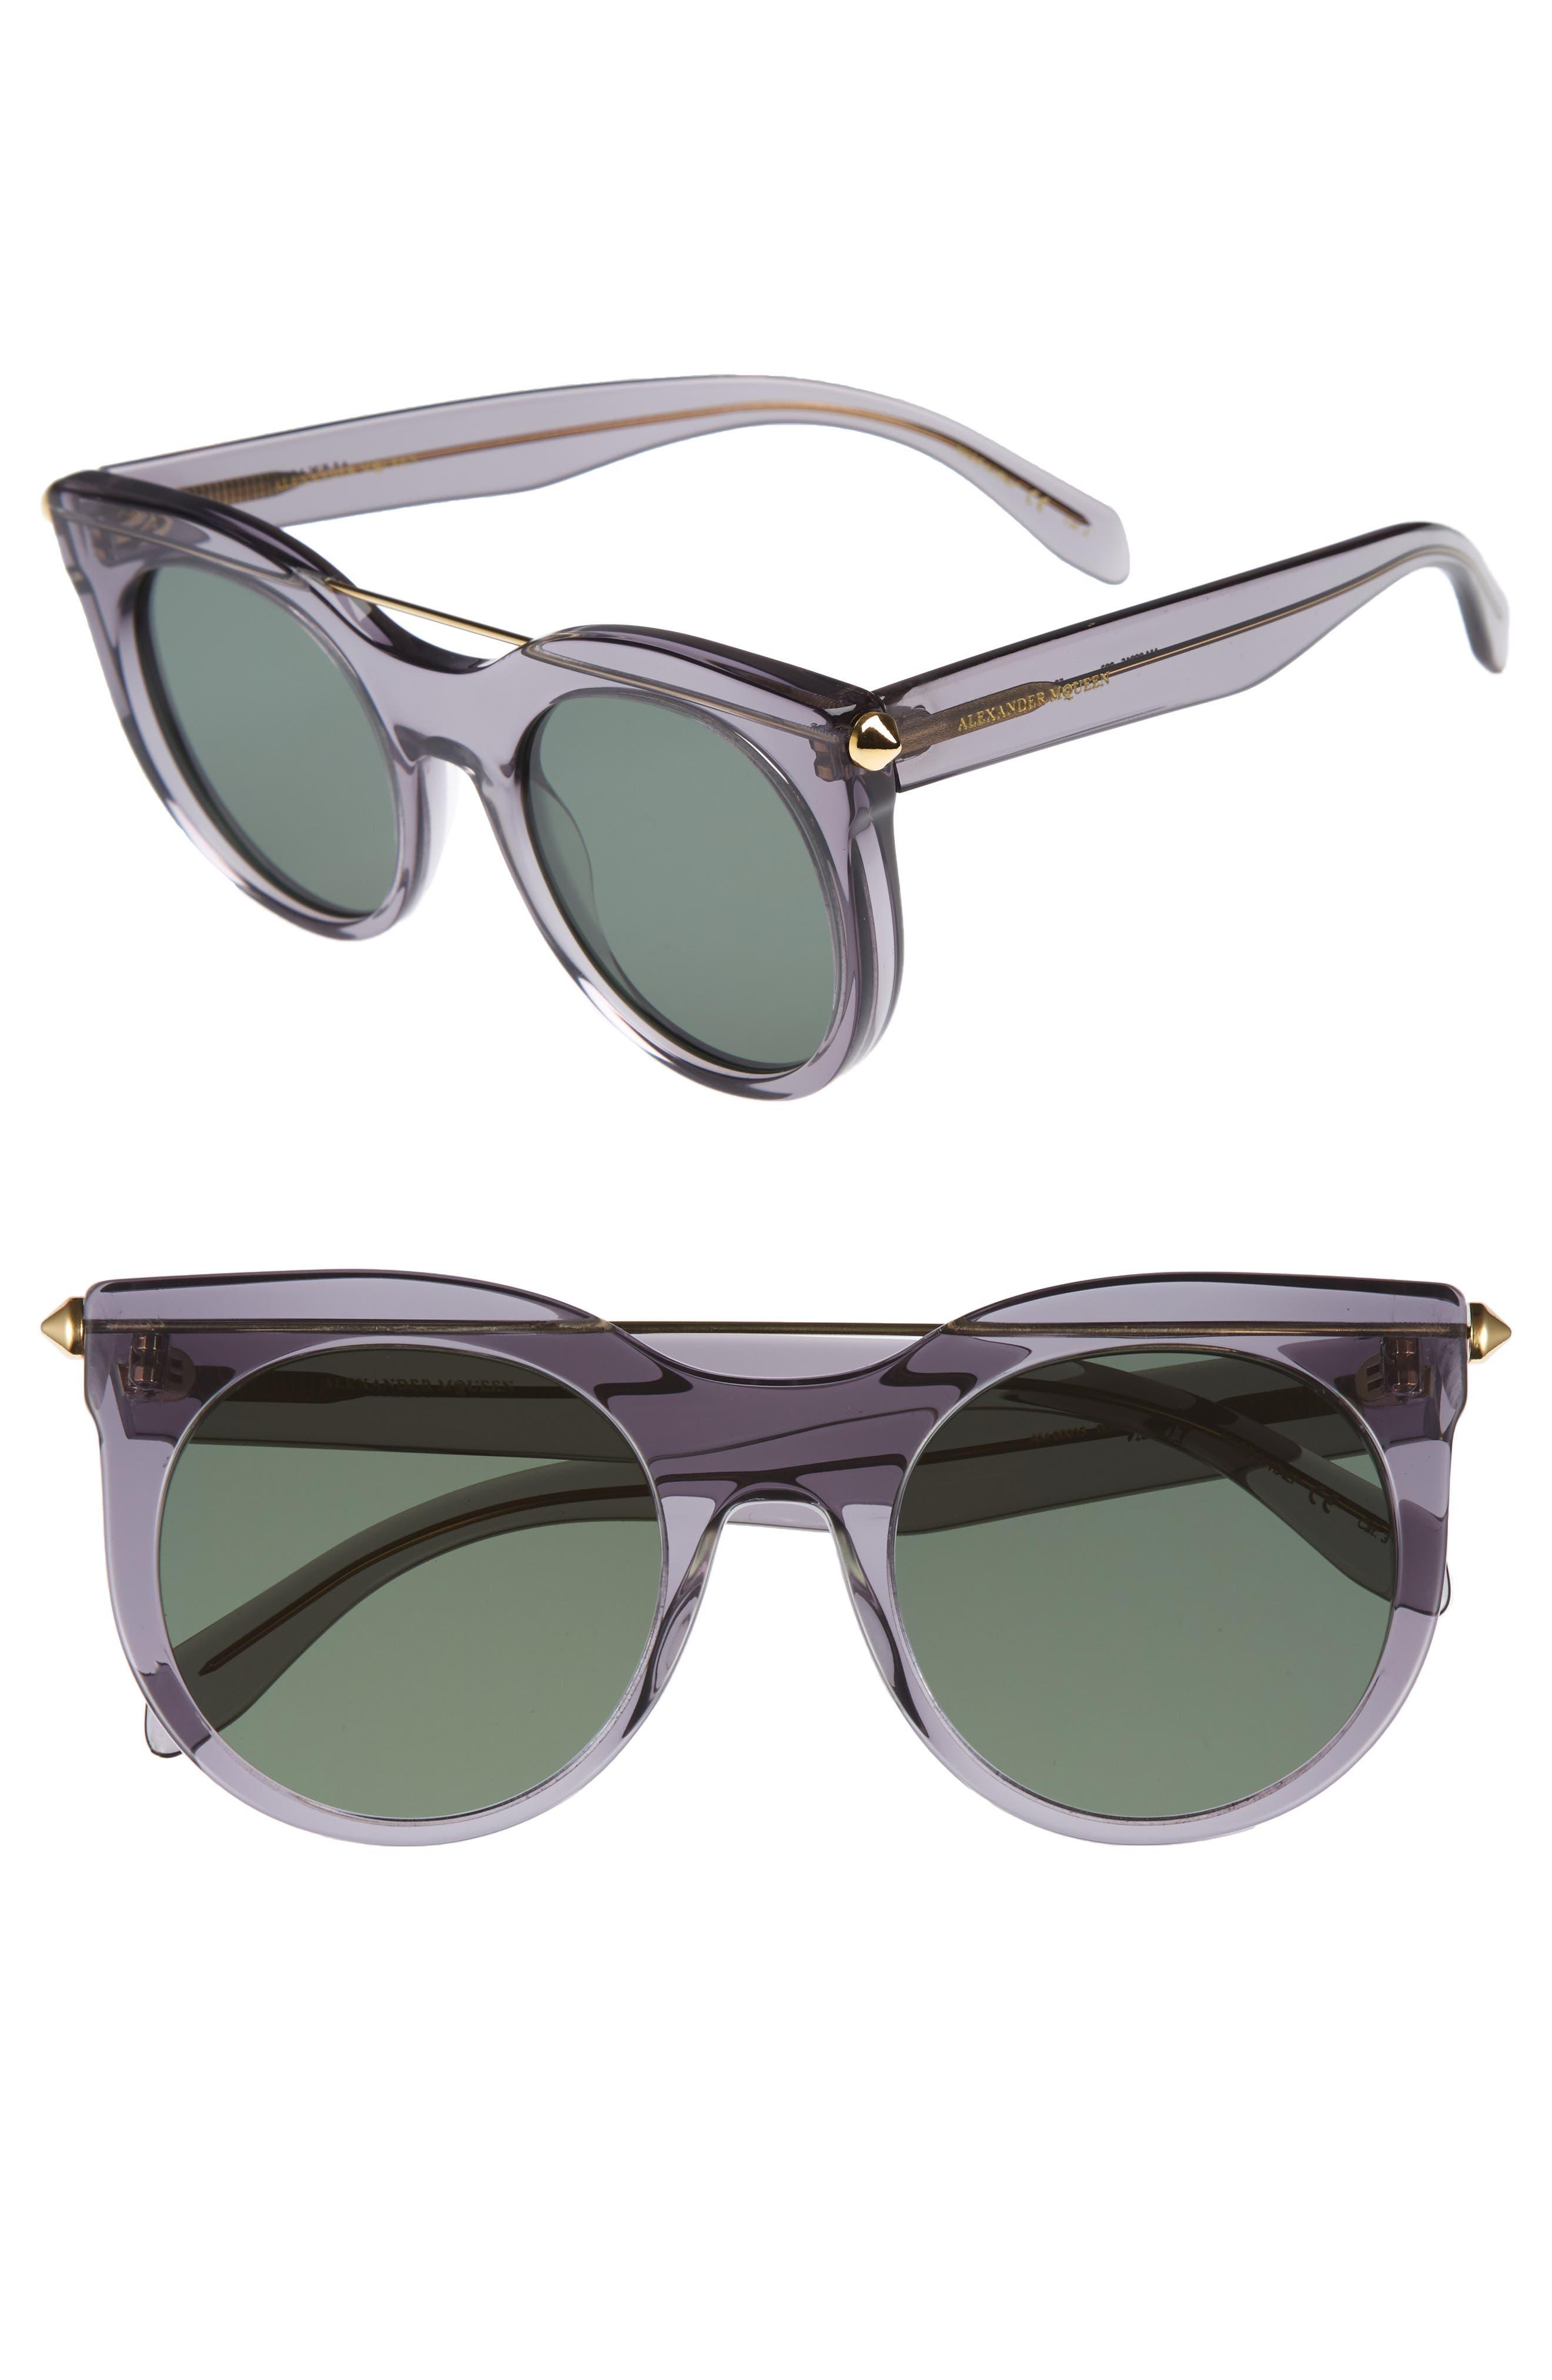 52mm Cat Eye Sunglasses,                         Main,                         color, Grey